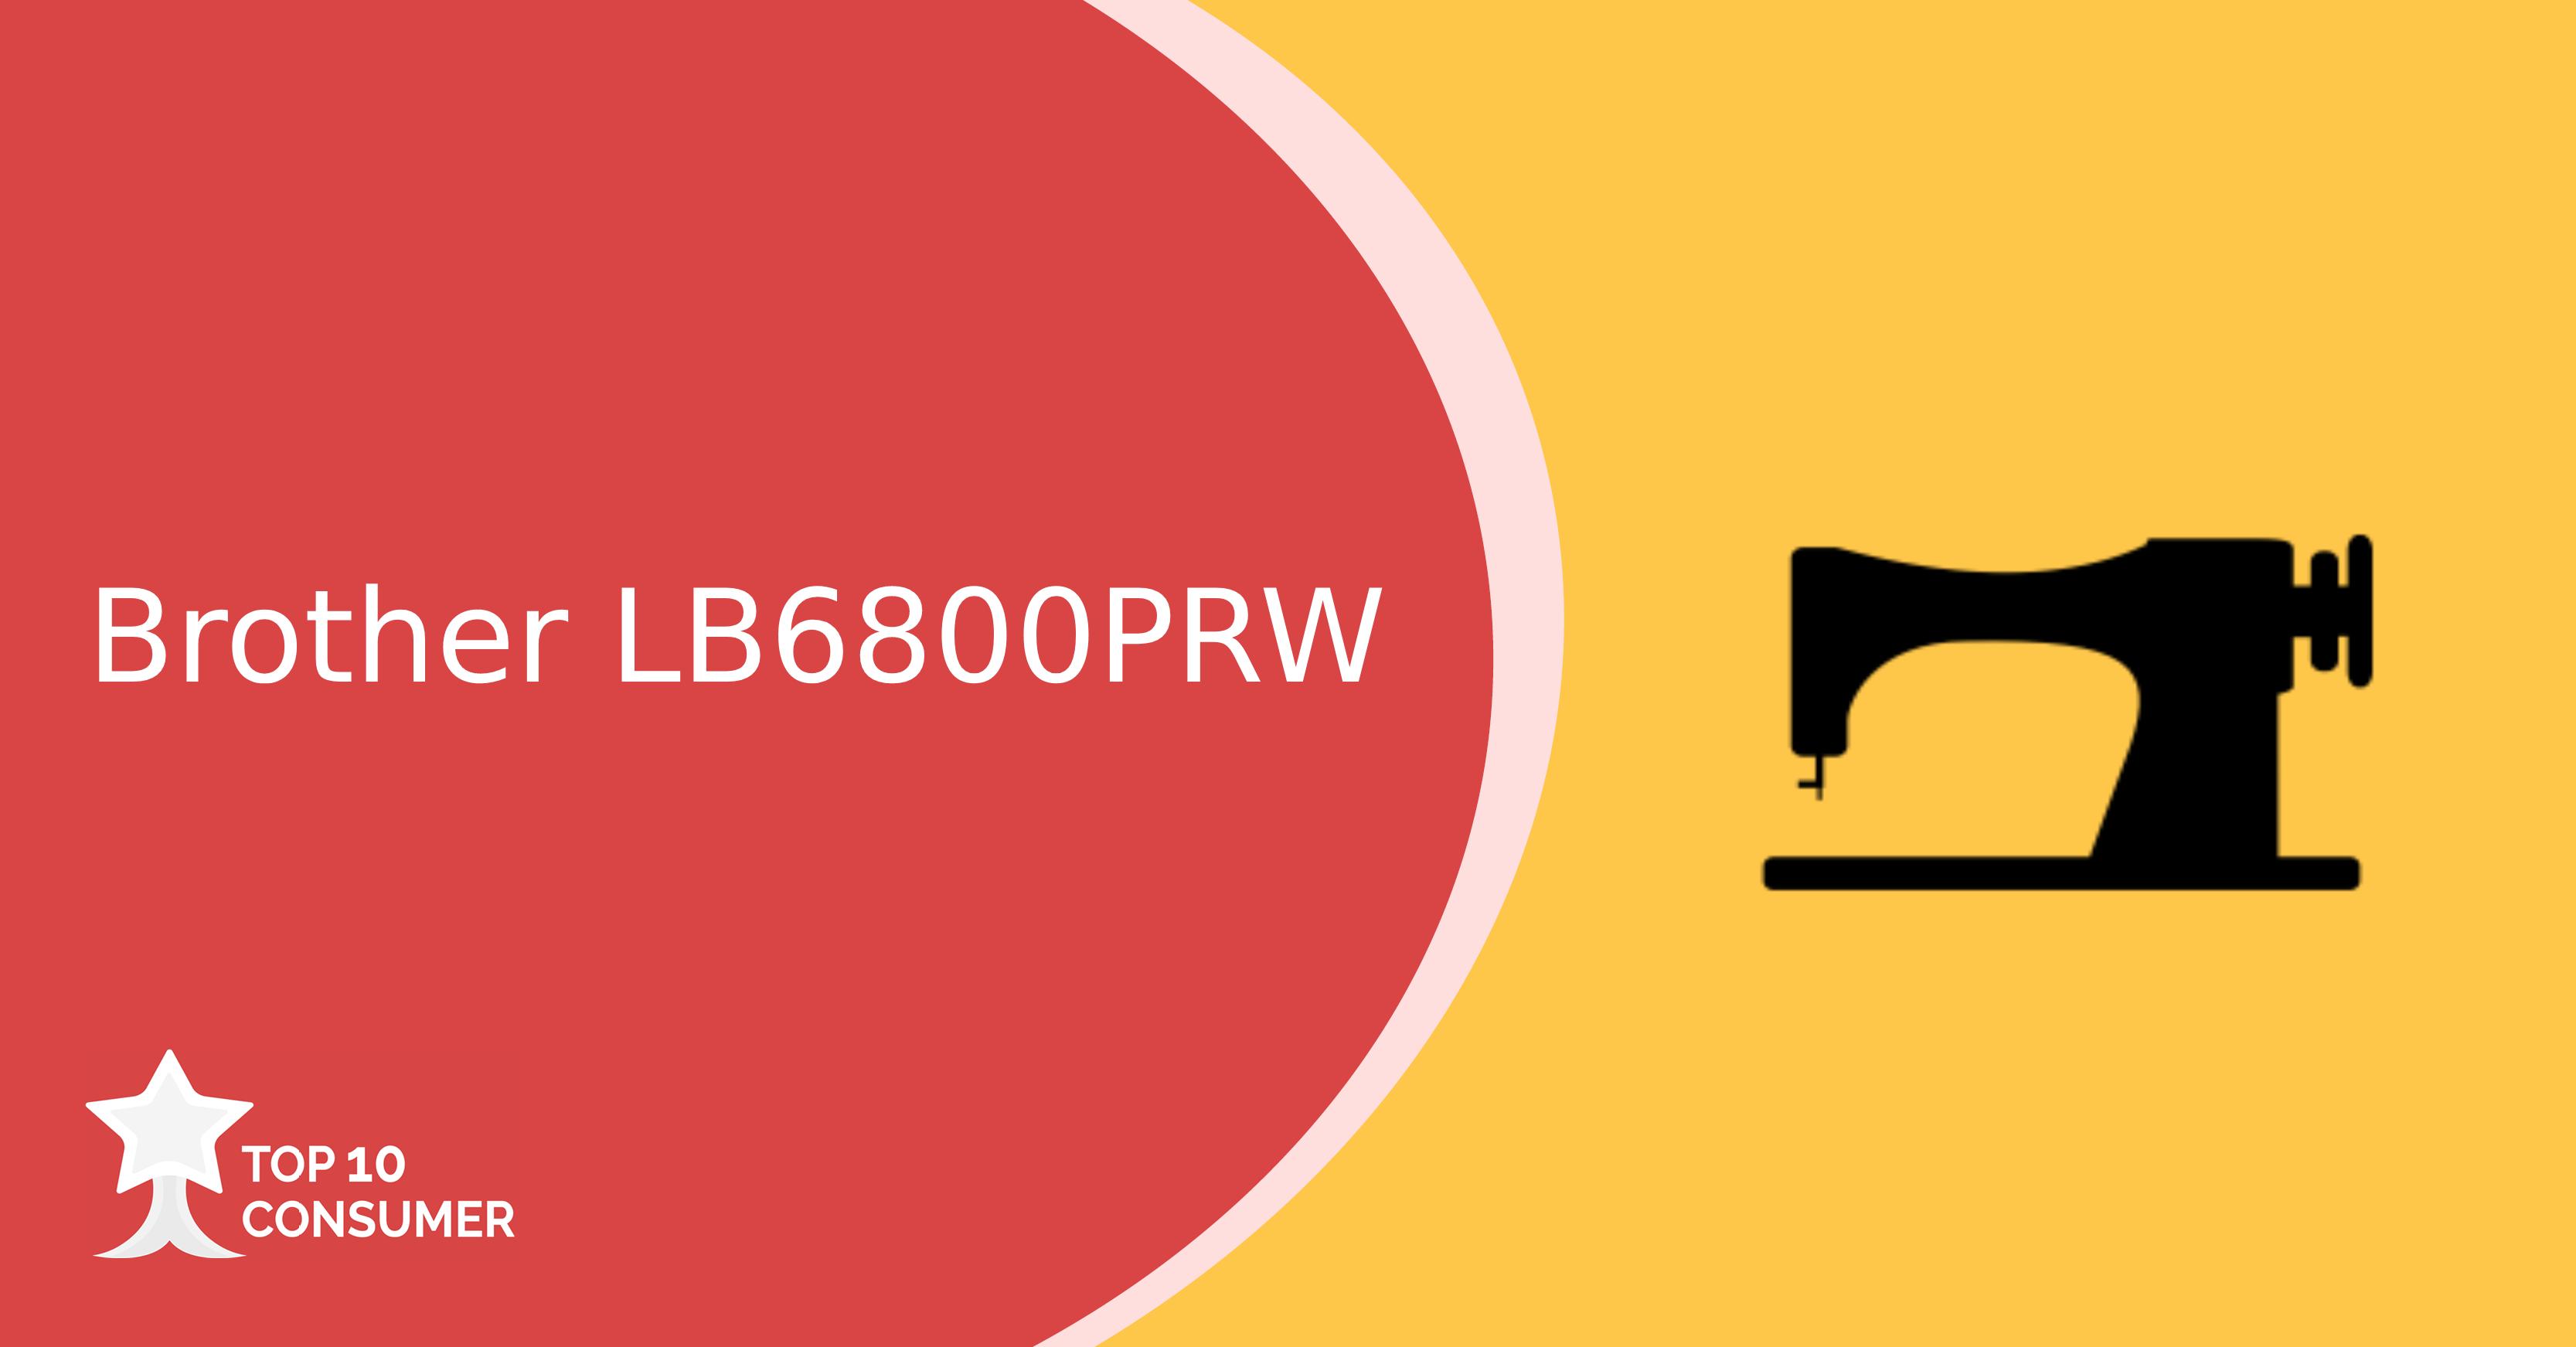 Brother LB6800PRW